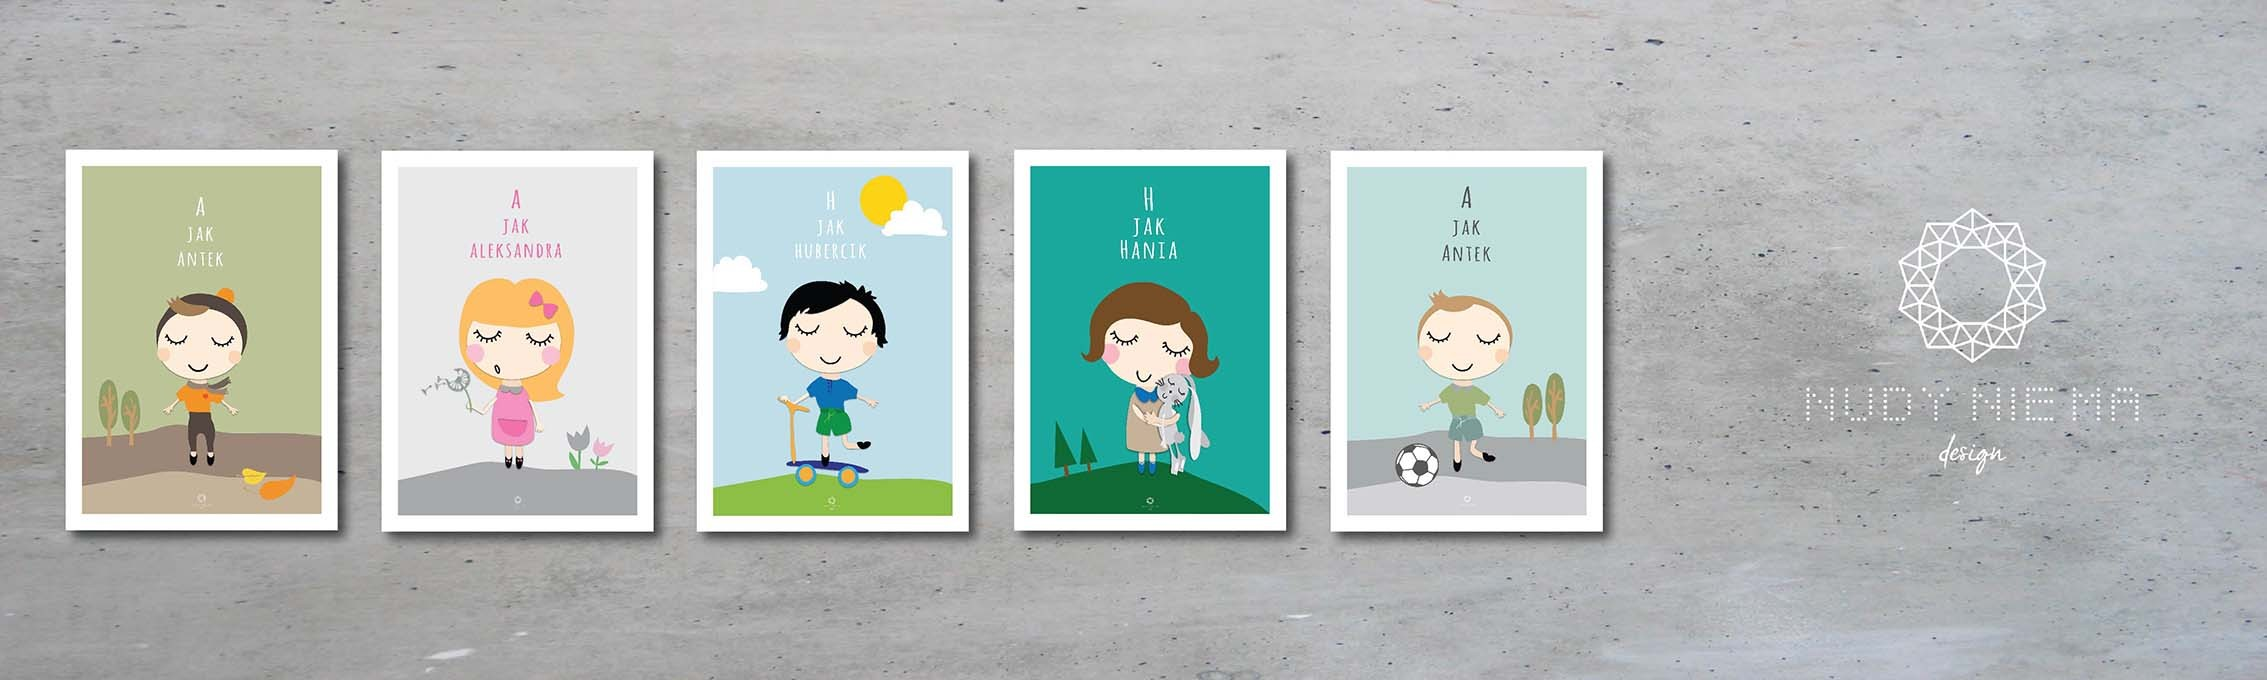 plakaty_personalizowane